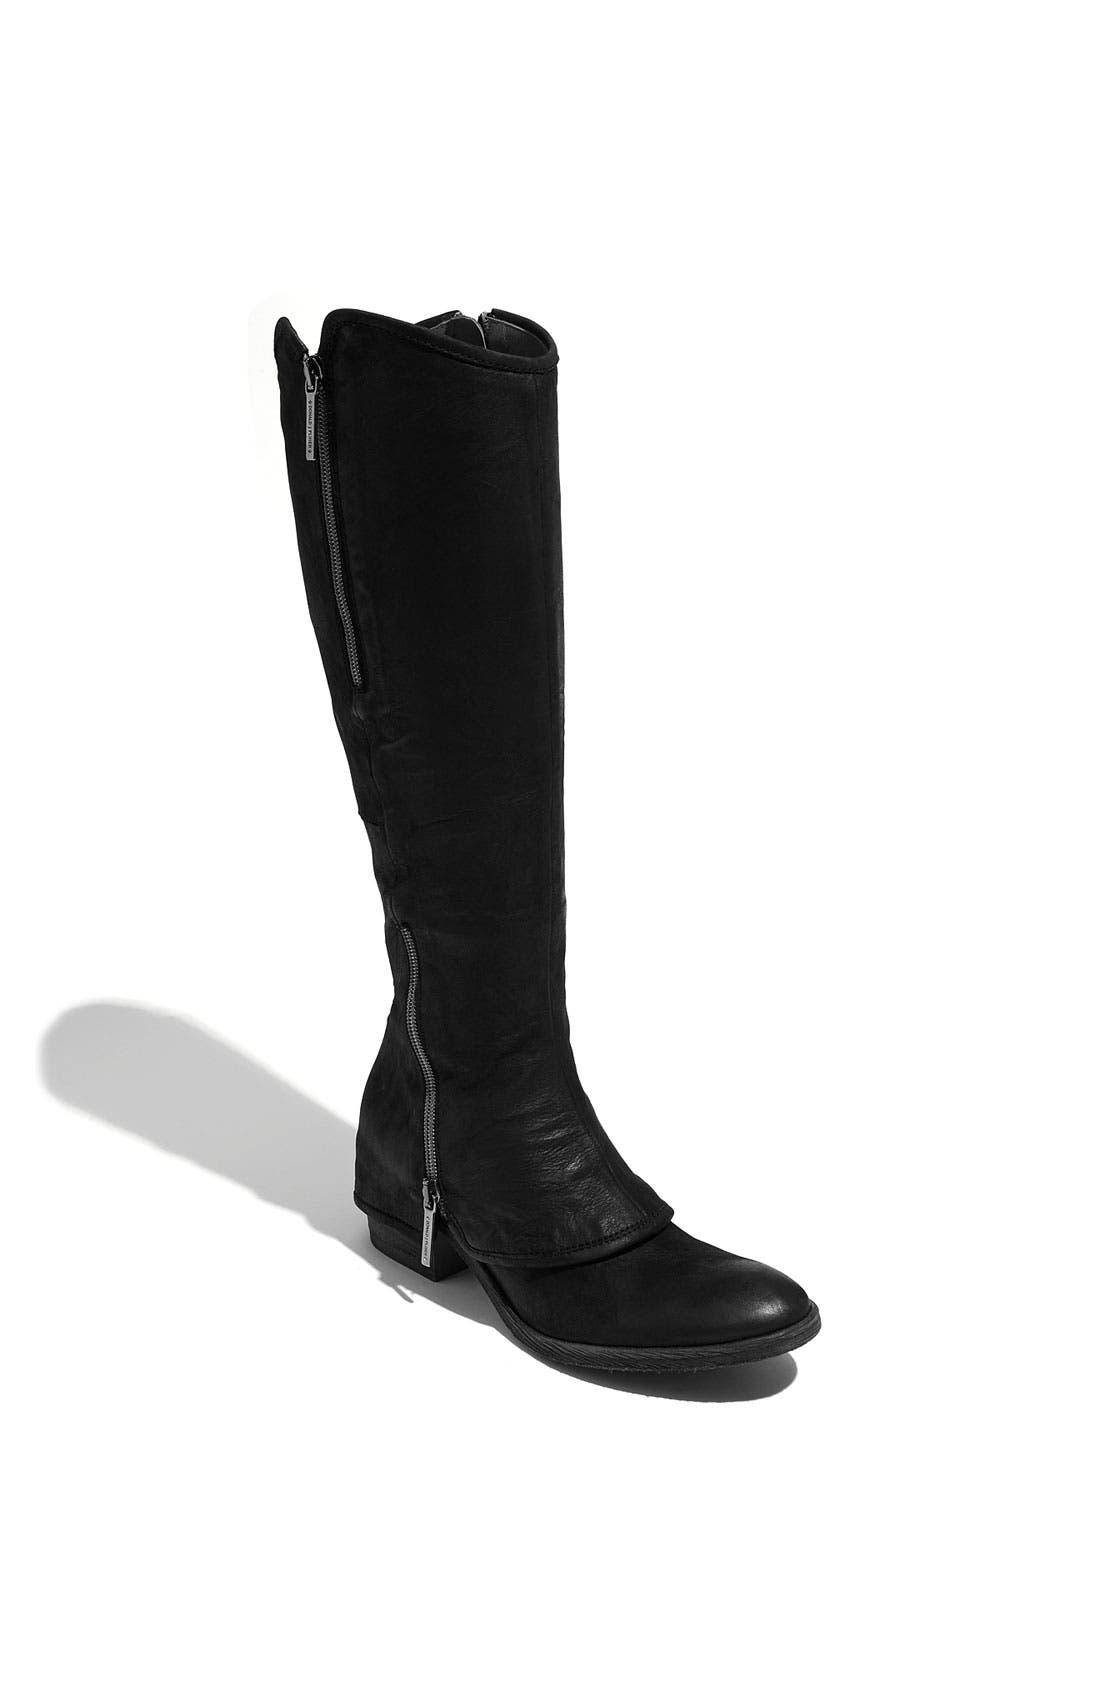 Main Image - Donald J Pliner 'Devi' Boot (Women)